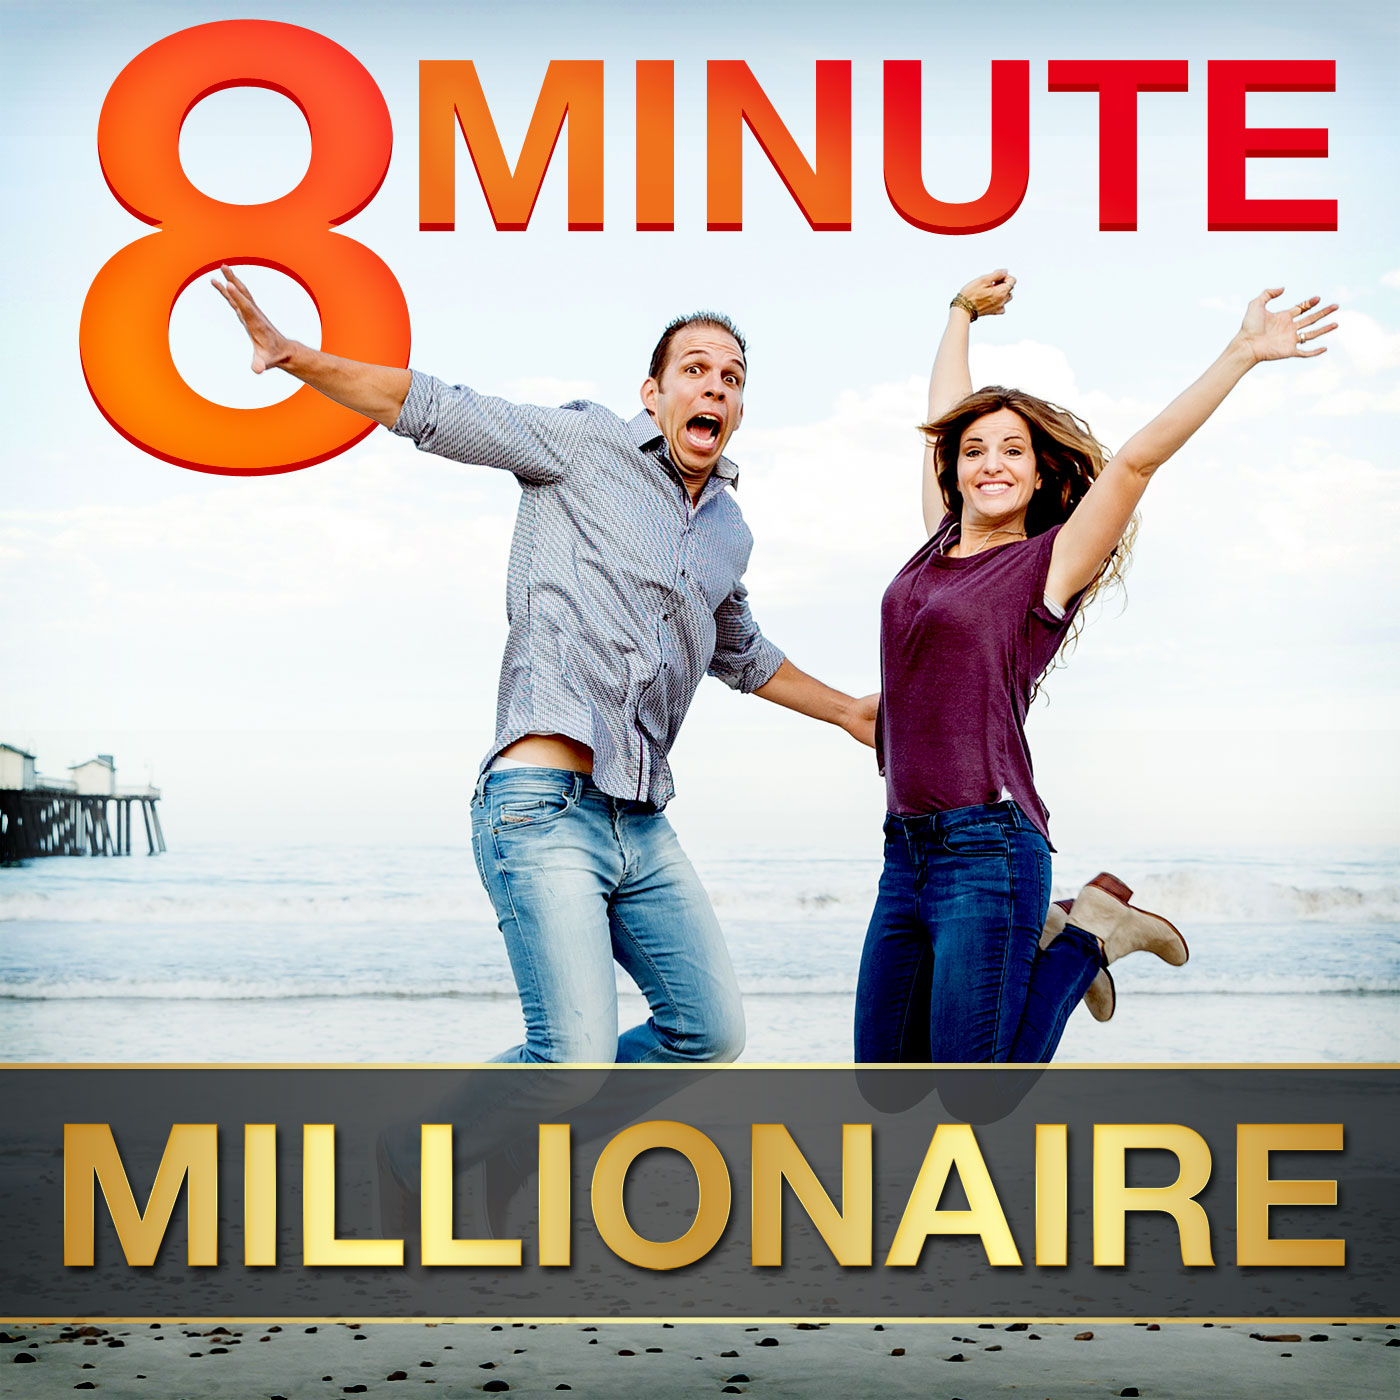 8 Minute Millionaire: Learn the Secrets of Millionaire Entrepreneurs show art